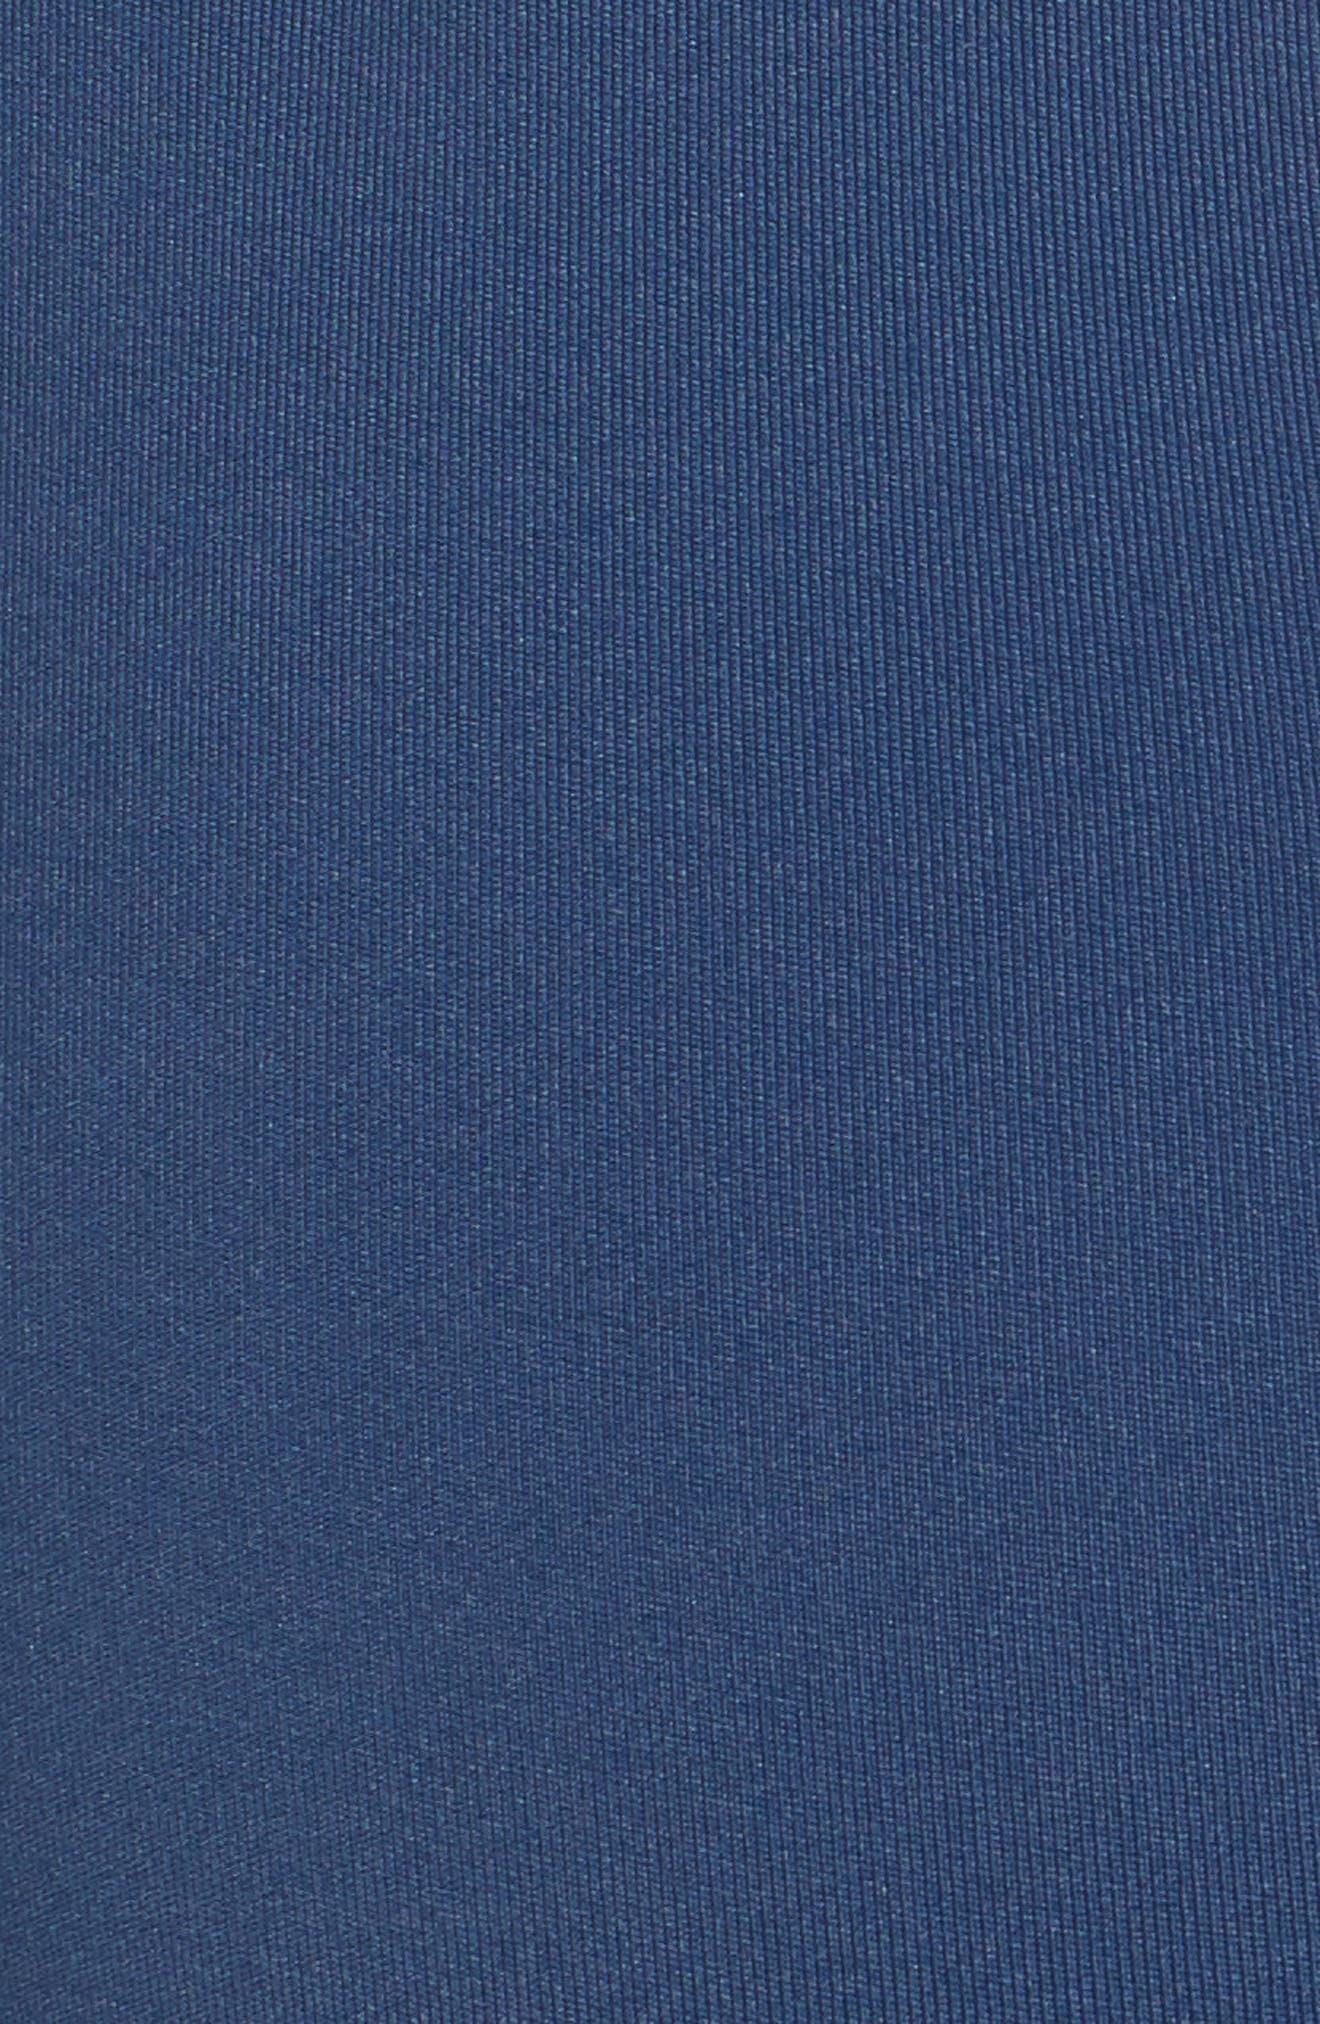 Marilyn Sports Bra,                             Alternate thumbnail 6, color,                             BLUE INSIGNIA